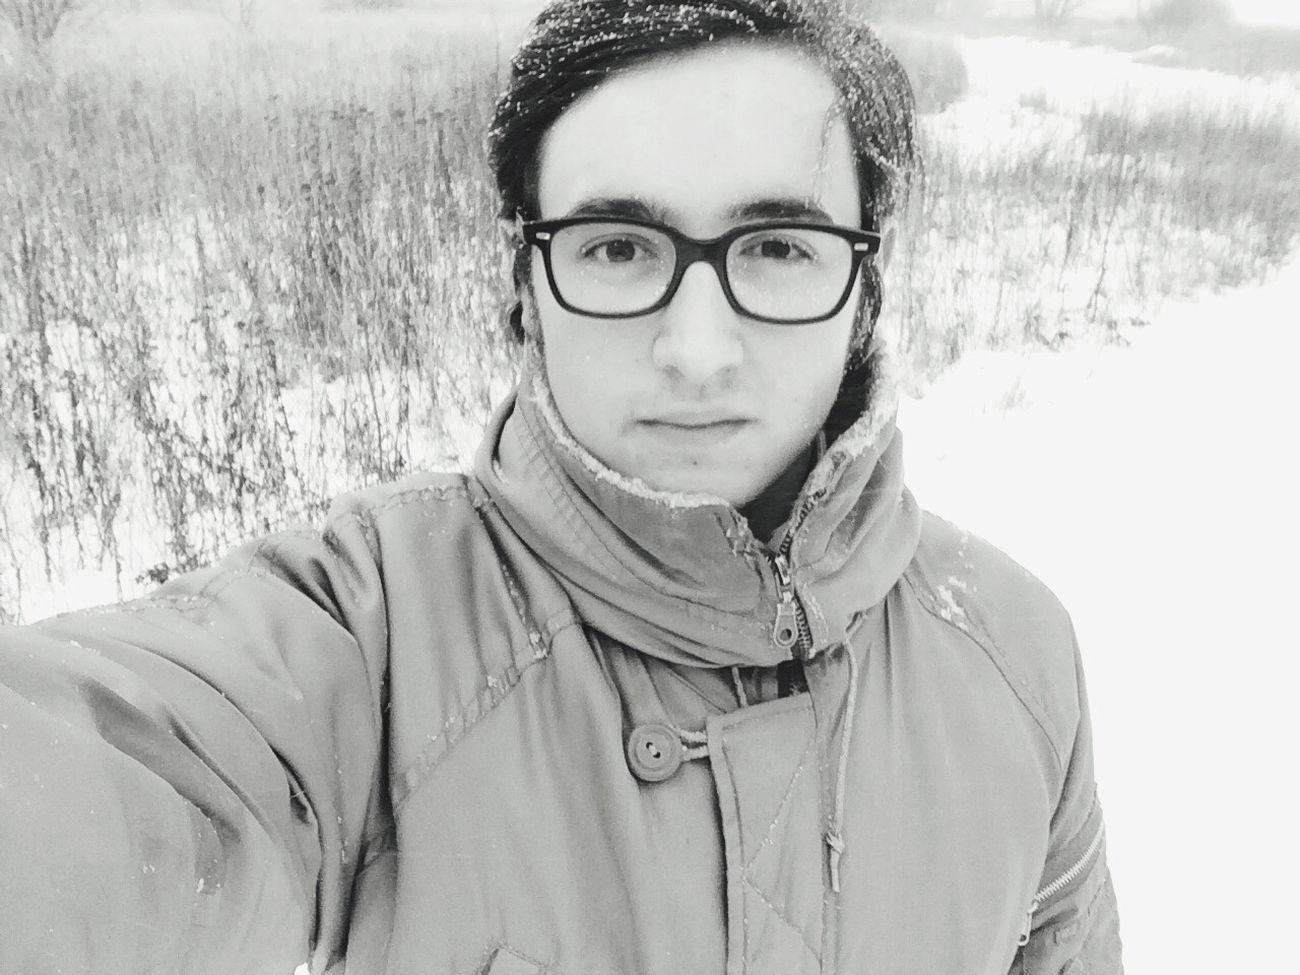 Селфач ✌️? я Россия январь зима дача деревня Стиль очки снег 2015